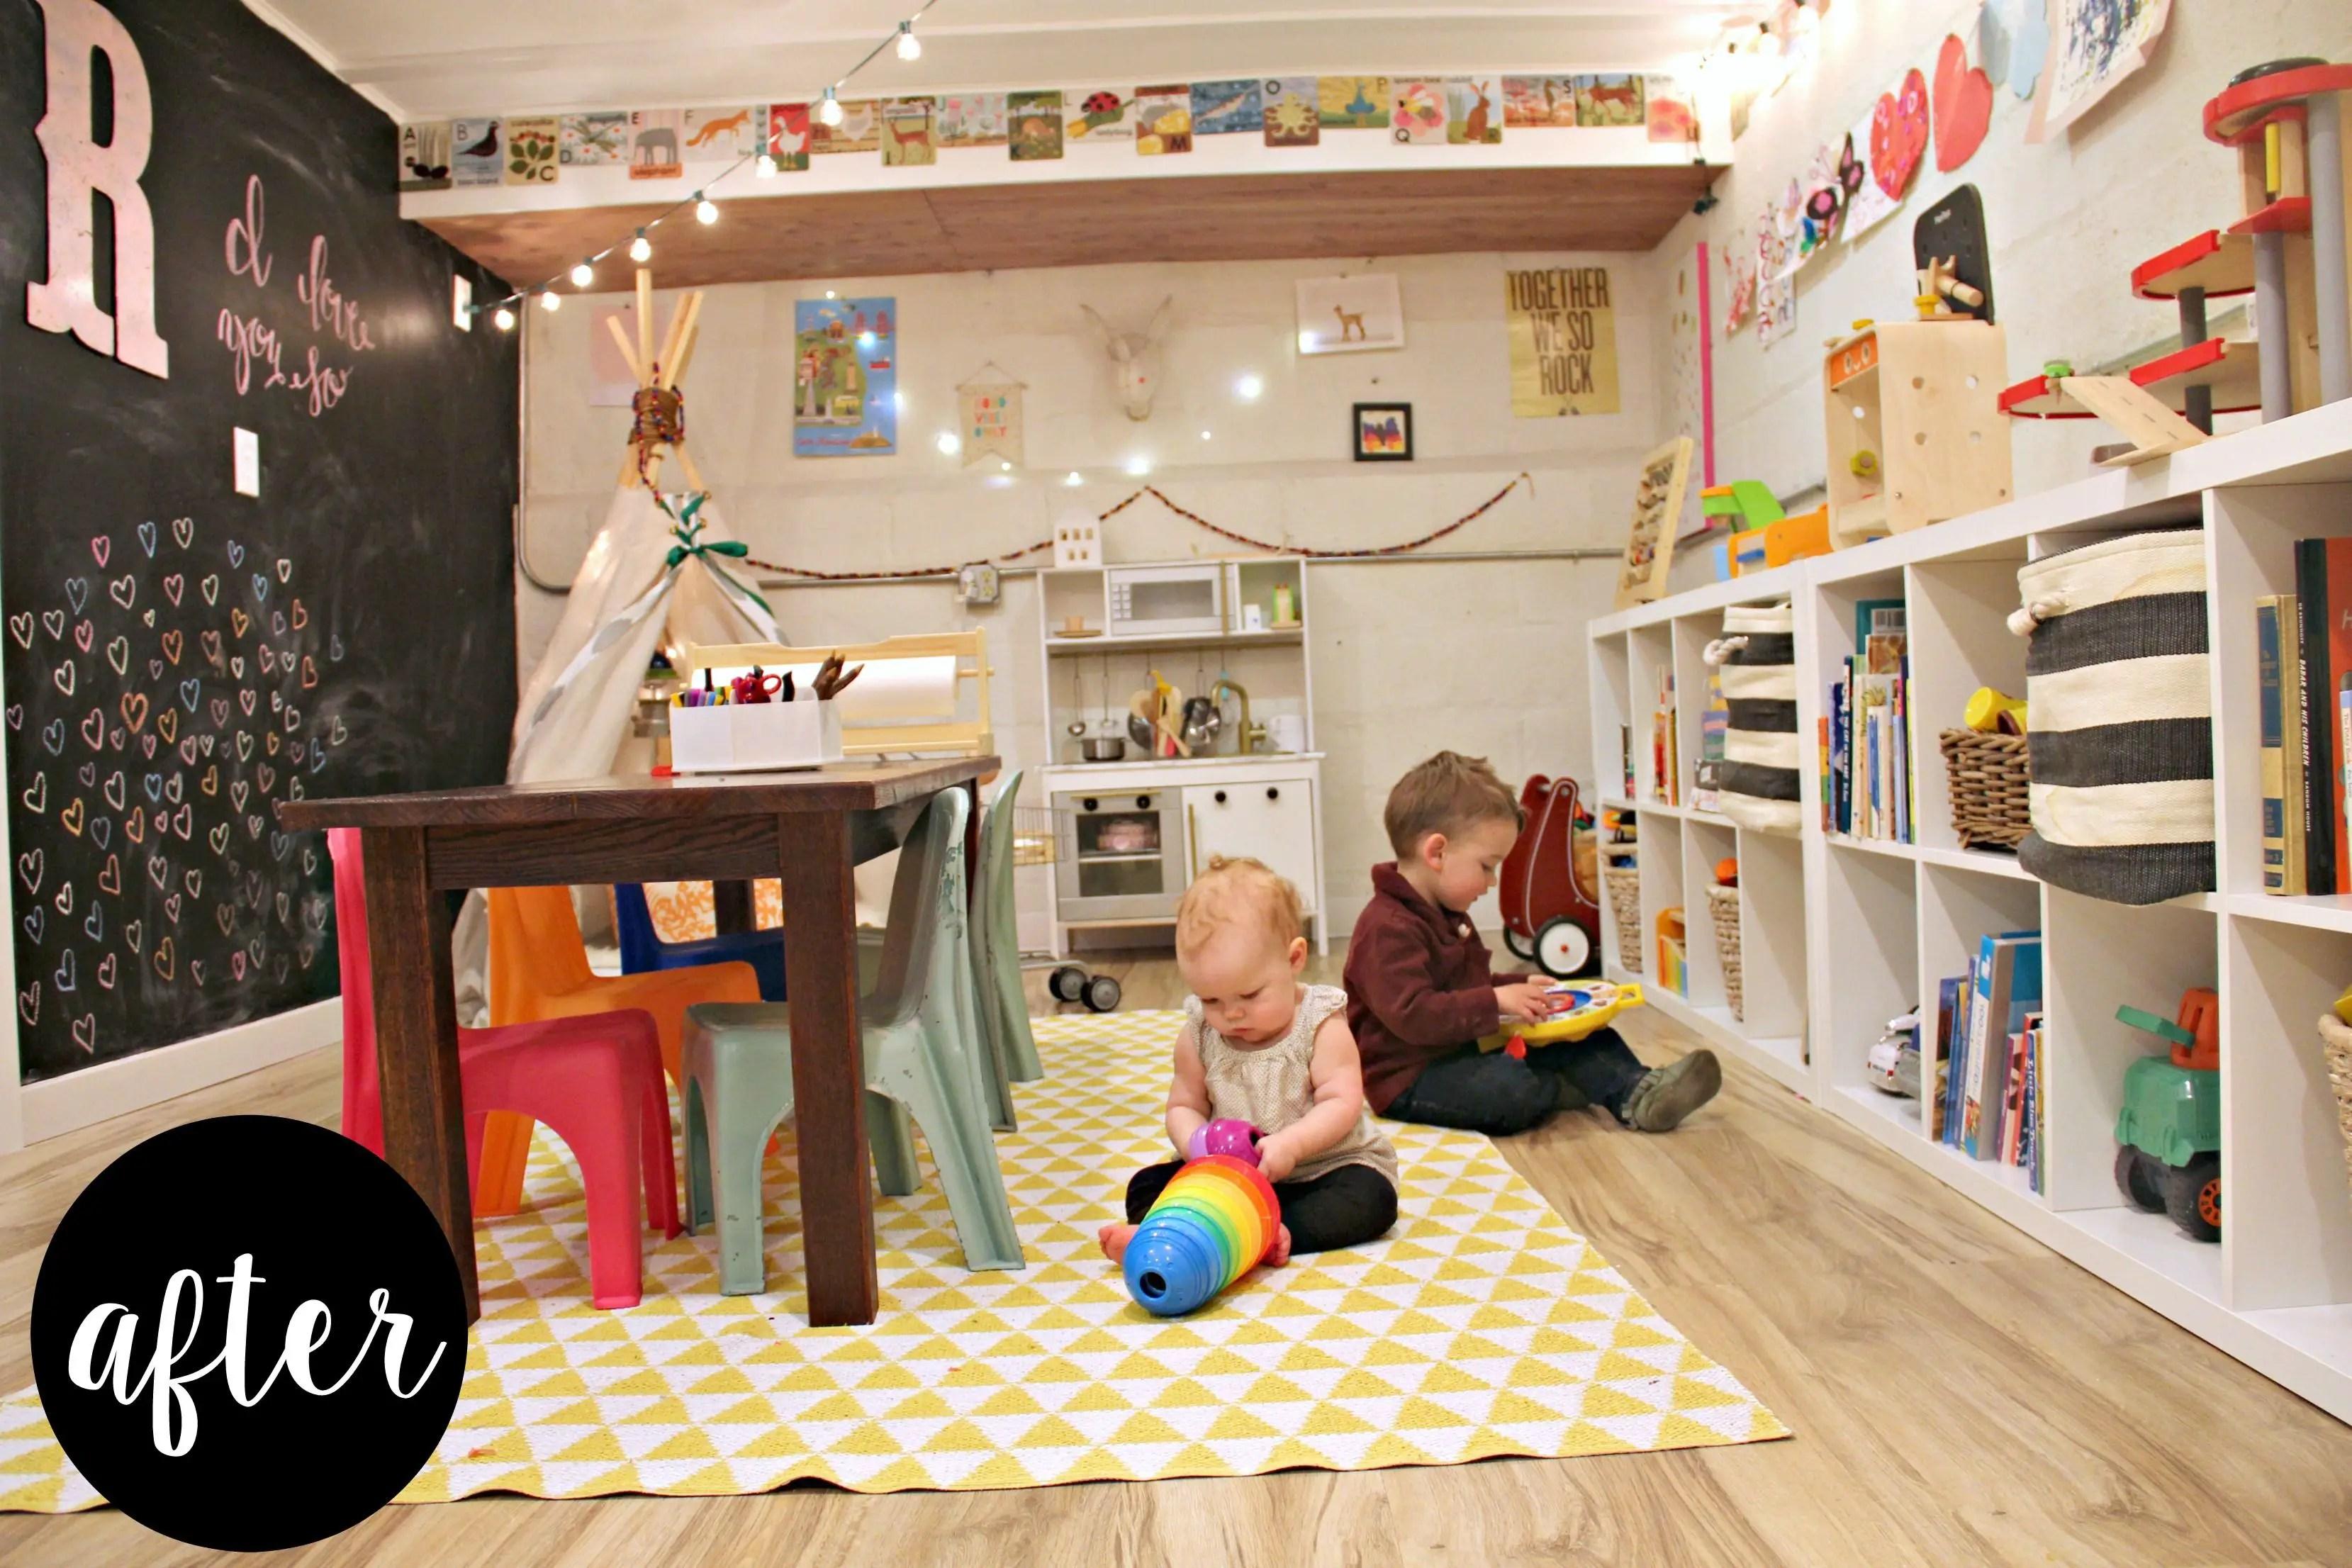 Basement Playroom Ideas 52 - decoratoo